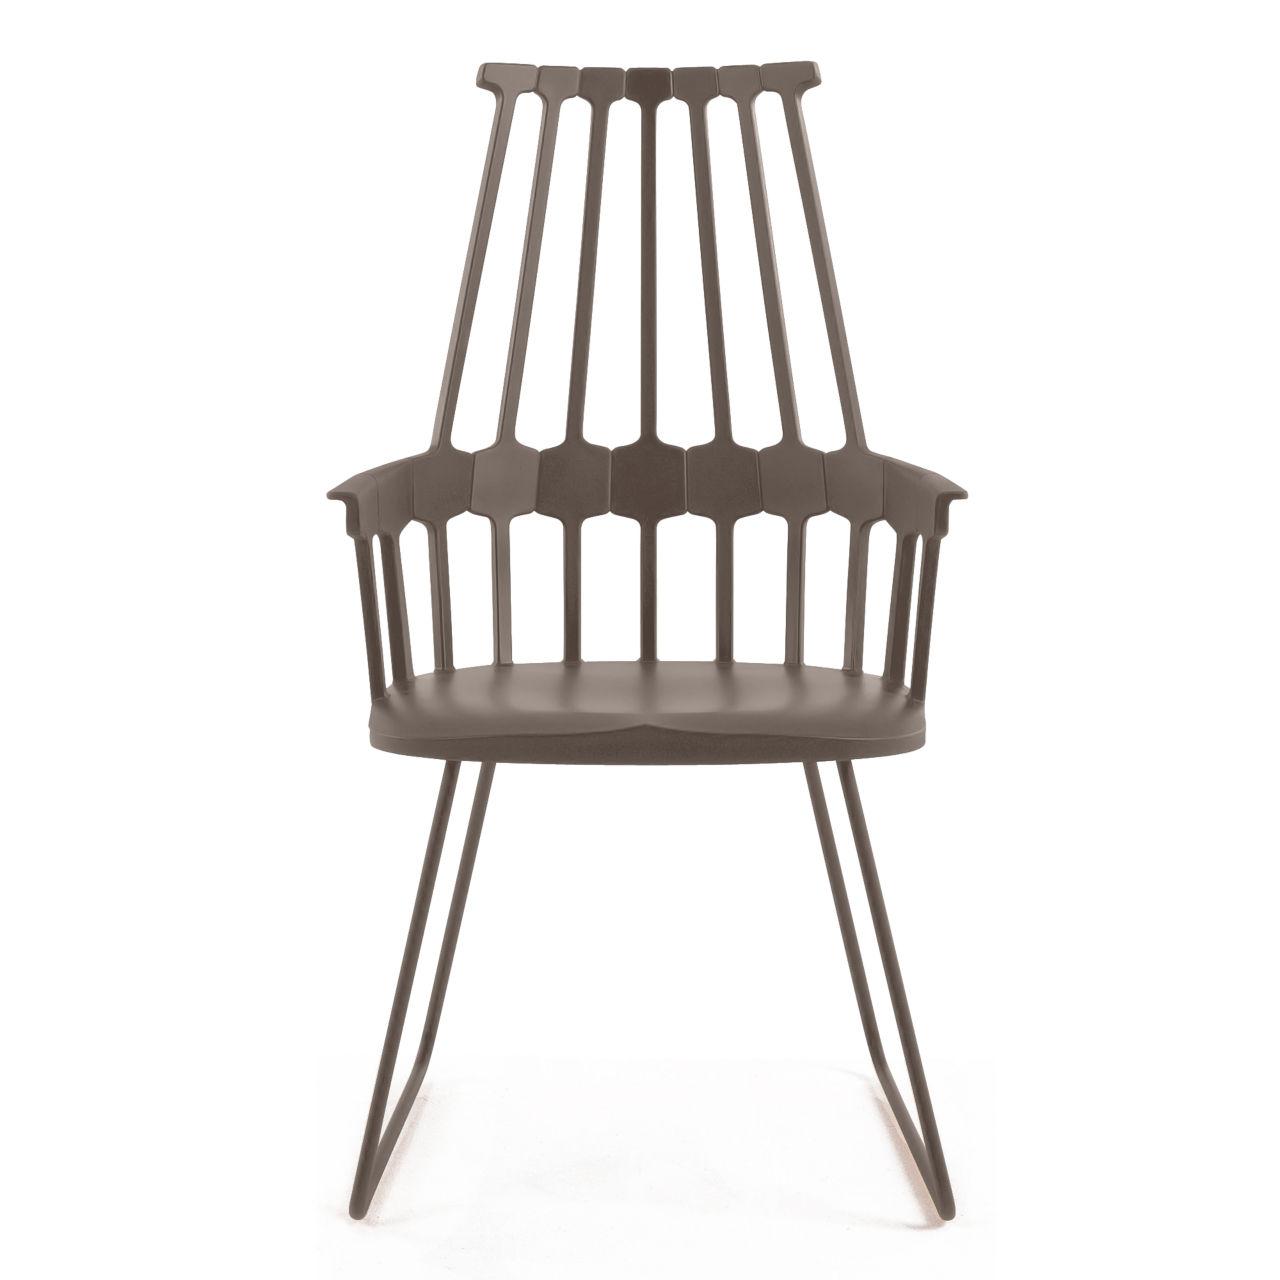 Comback Chair in Hazelnut by Kartell